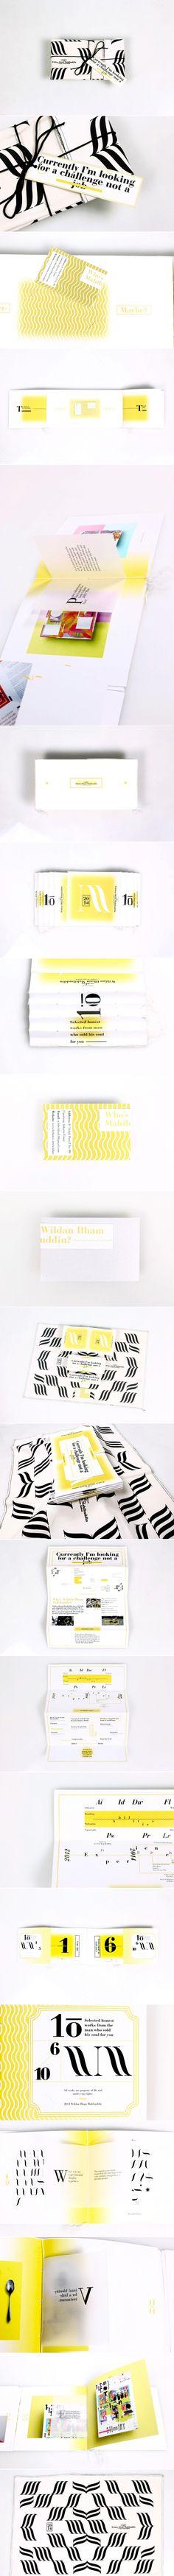 Student Resume: WIM — The Dieline | Packaging & Branding Design & Innovation News